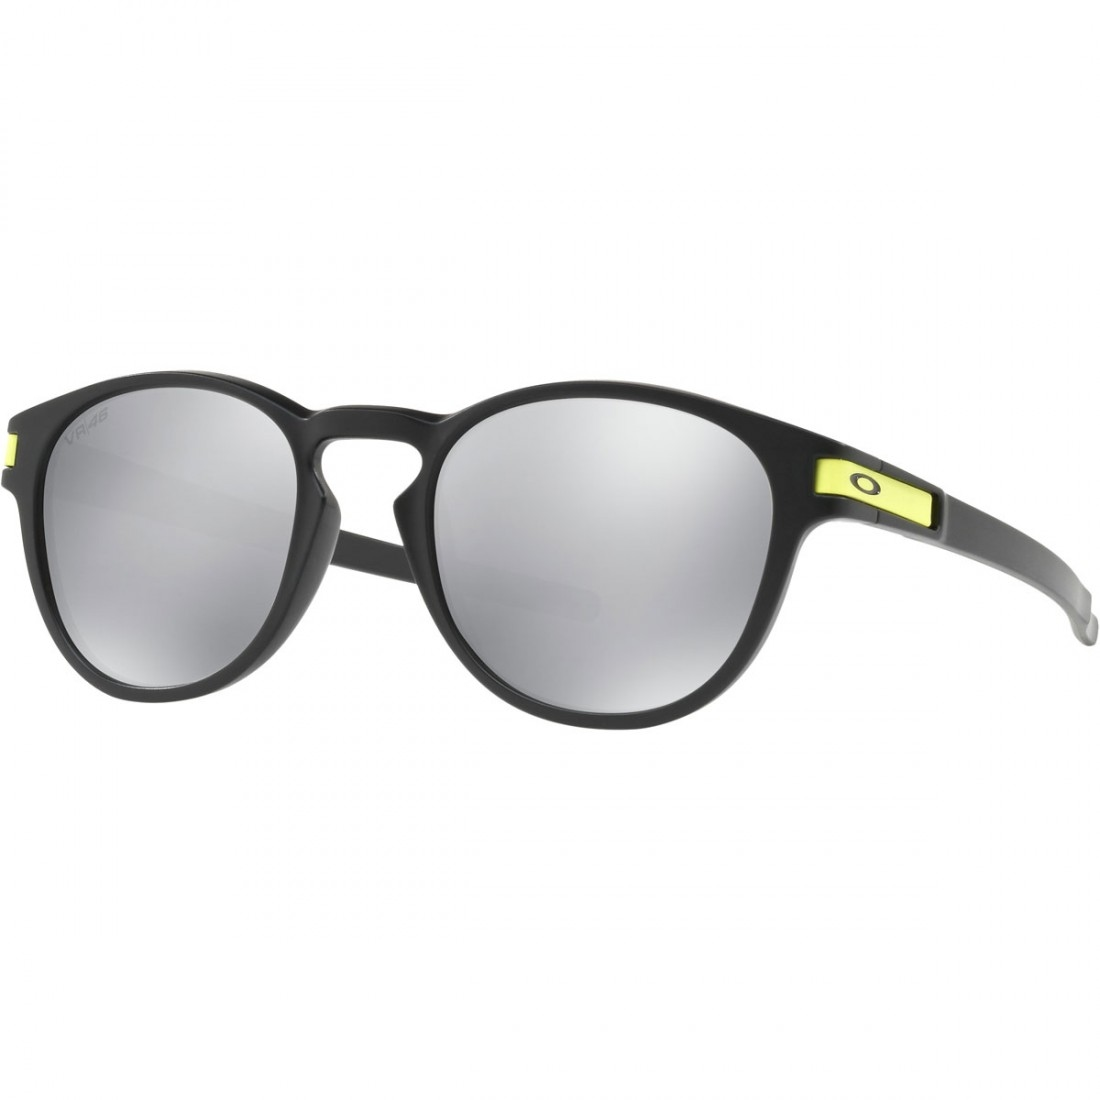 f104273decb Lunettes de soleil OAKLEY Latch Valentino Rossi Signature Series Matte  Black   Chrome Iridium